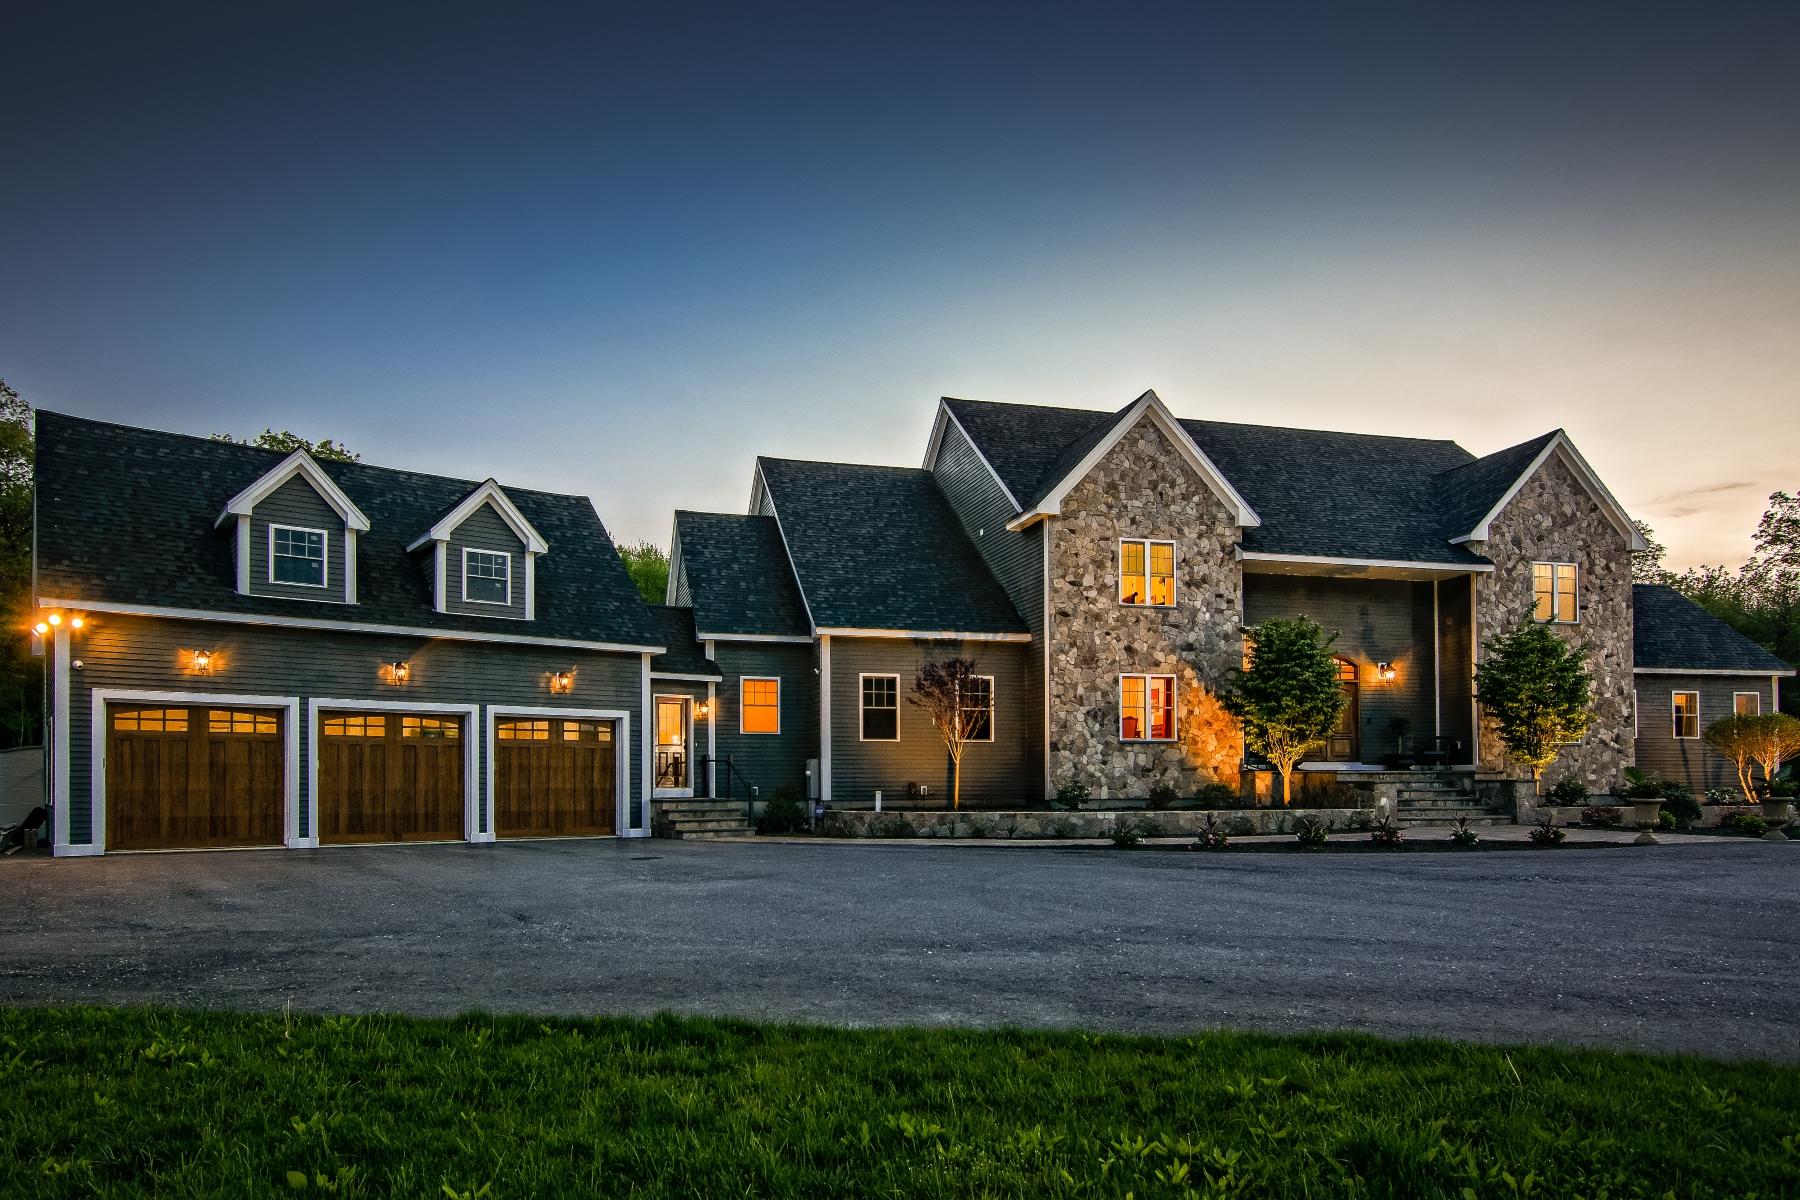 Single Family Homes pour l Vente à Stunning Country Home Which Captures The Imagination 51 Burbank Road Sutton, Massachusetts 01590 États-Unis